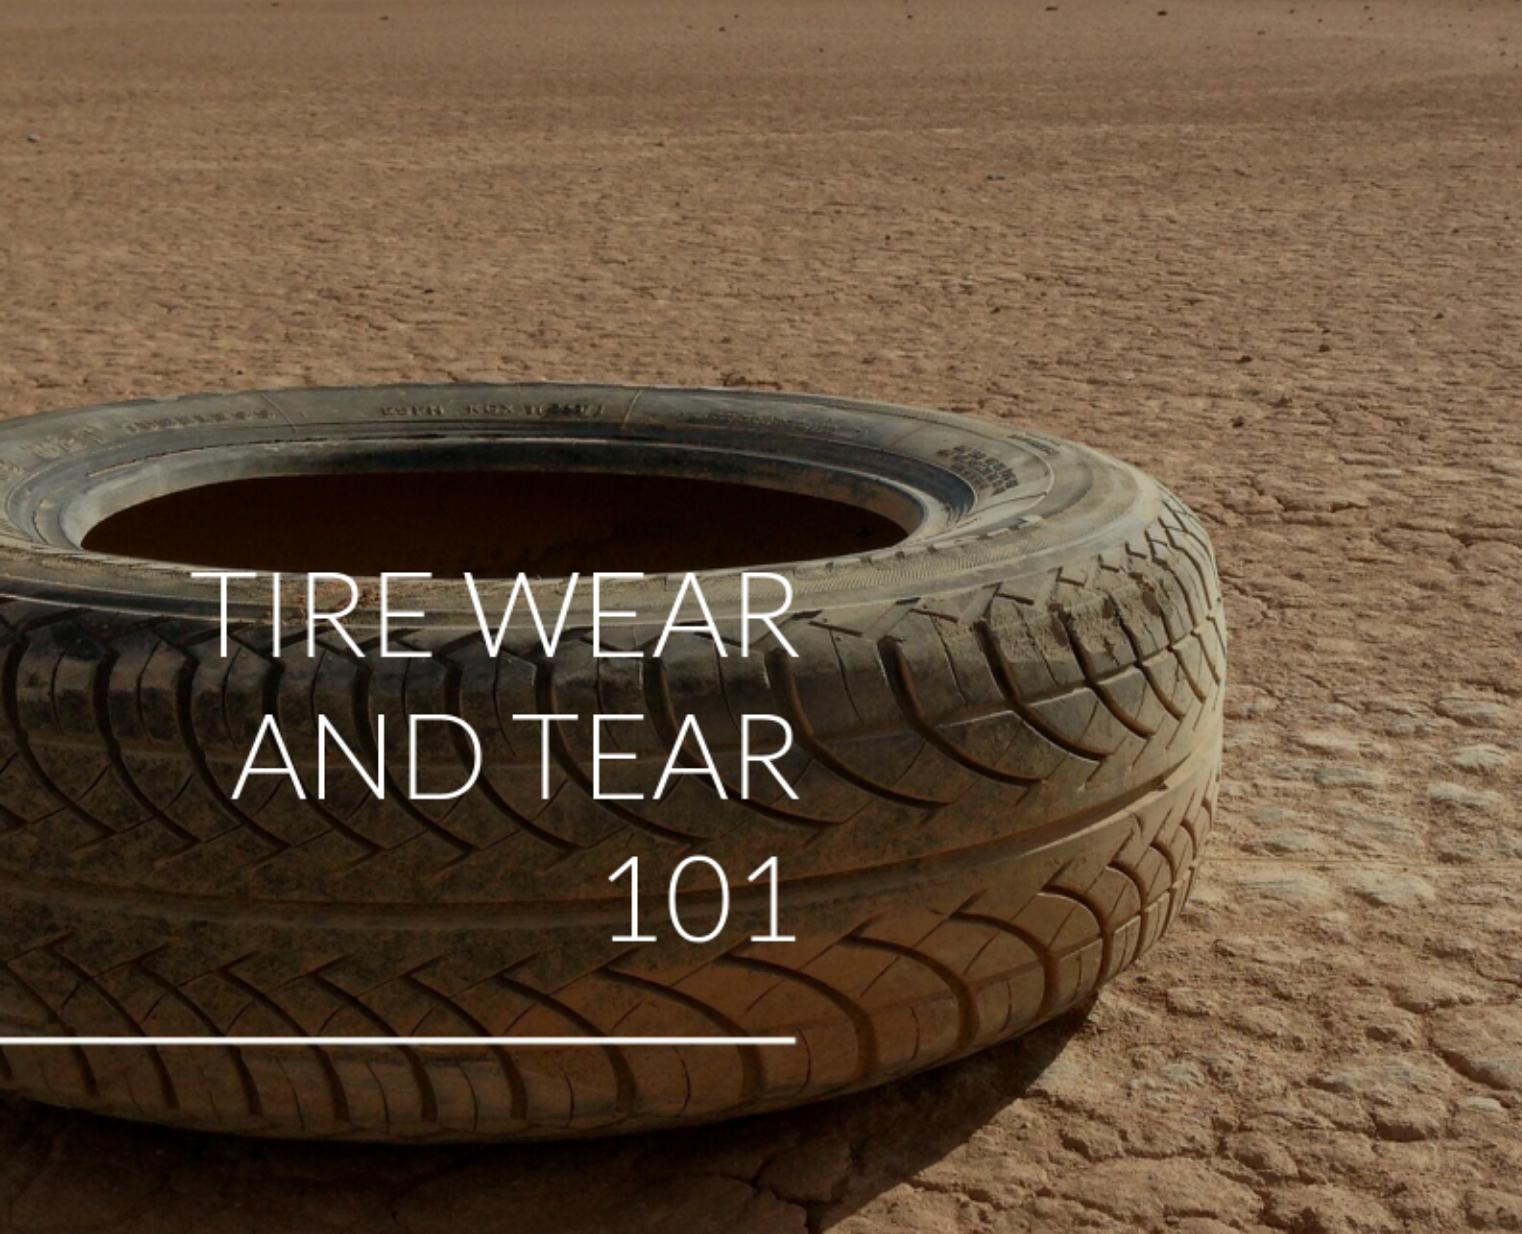 Tire Wear and Tear 101 - All In The Wrist Albuquerque Auto Repair